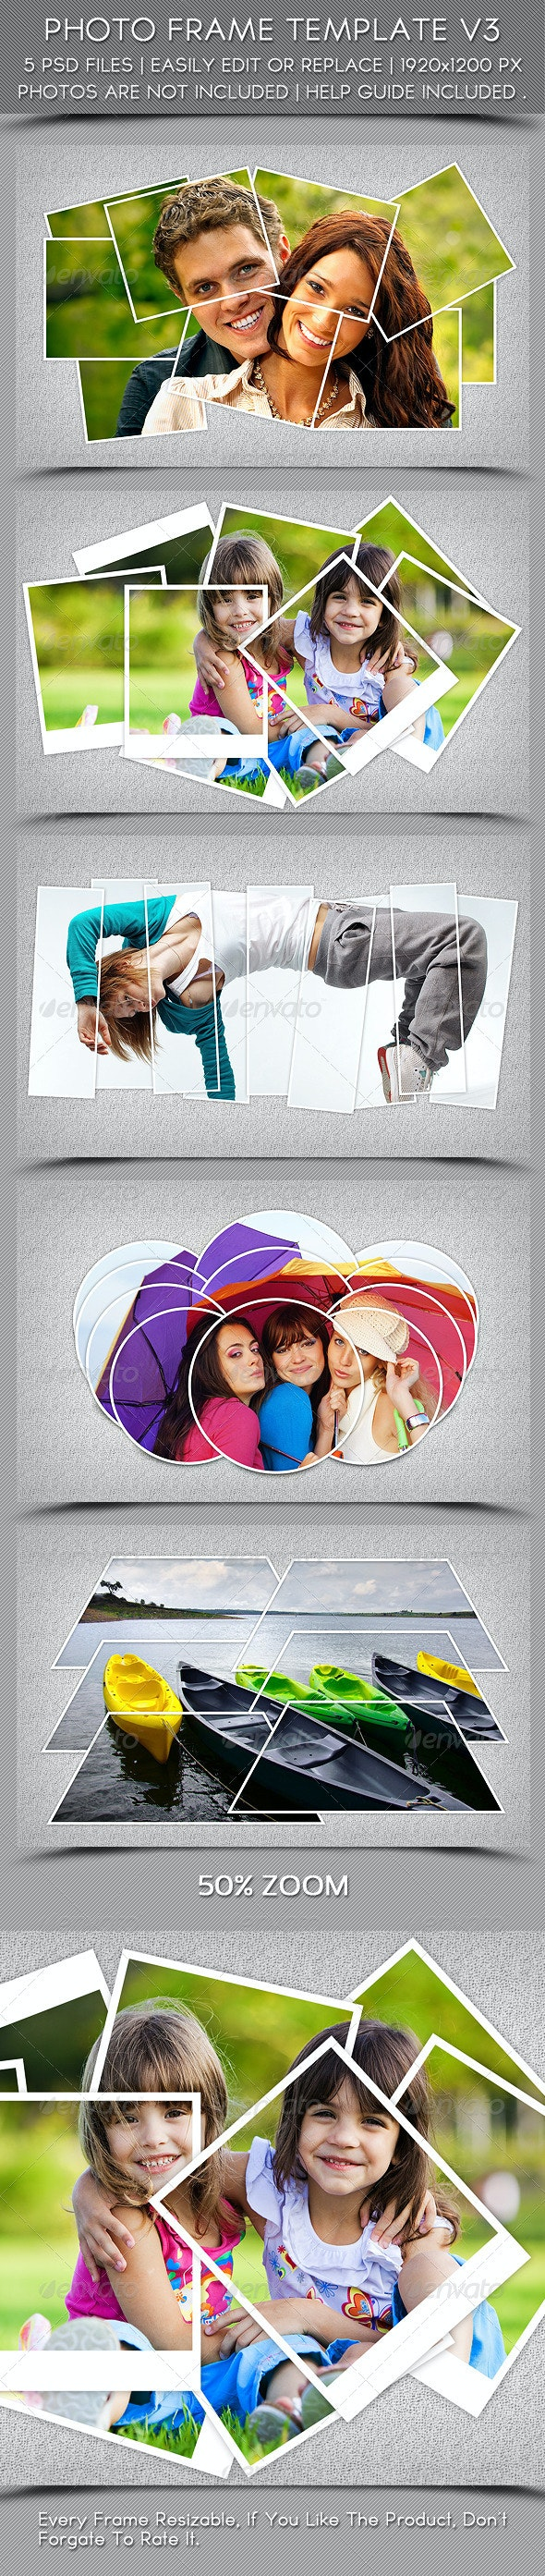 Photo Frame Template V3 - Photo Templates Graphics